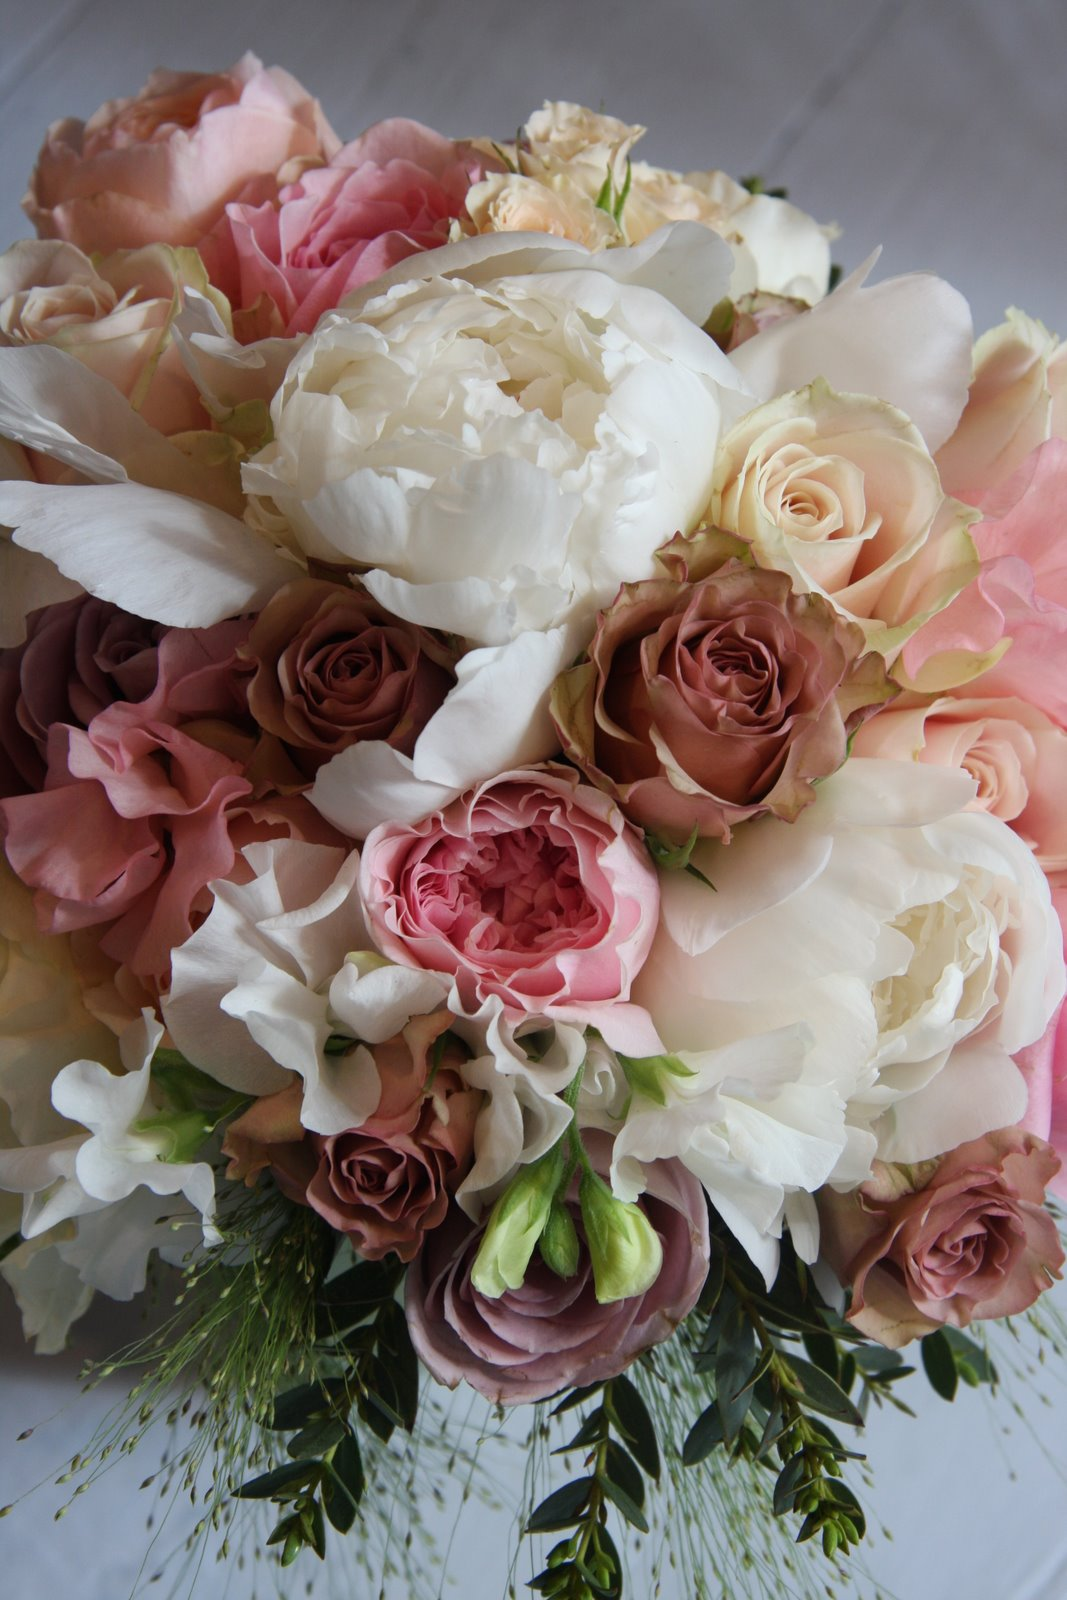 Vintage Wedding Bouquet of Peonies & English Garden Roses